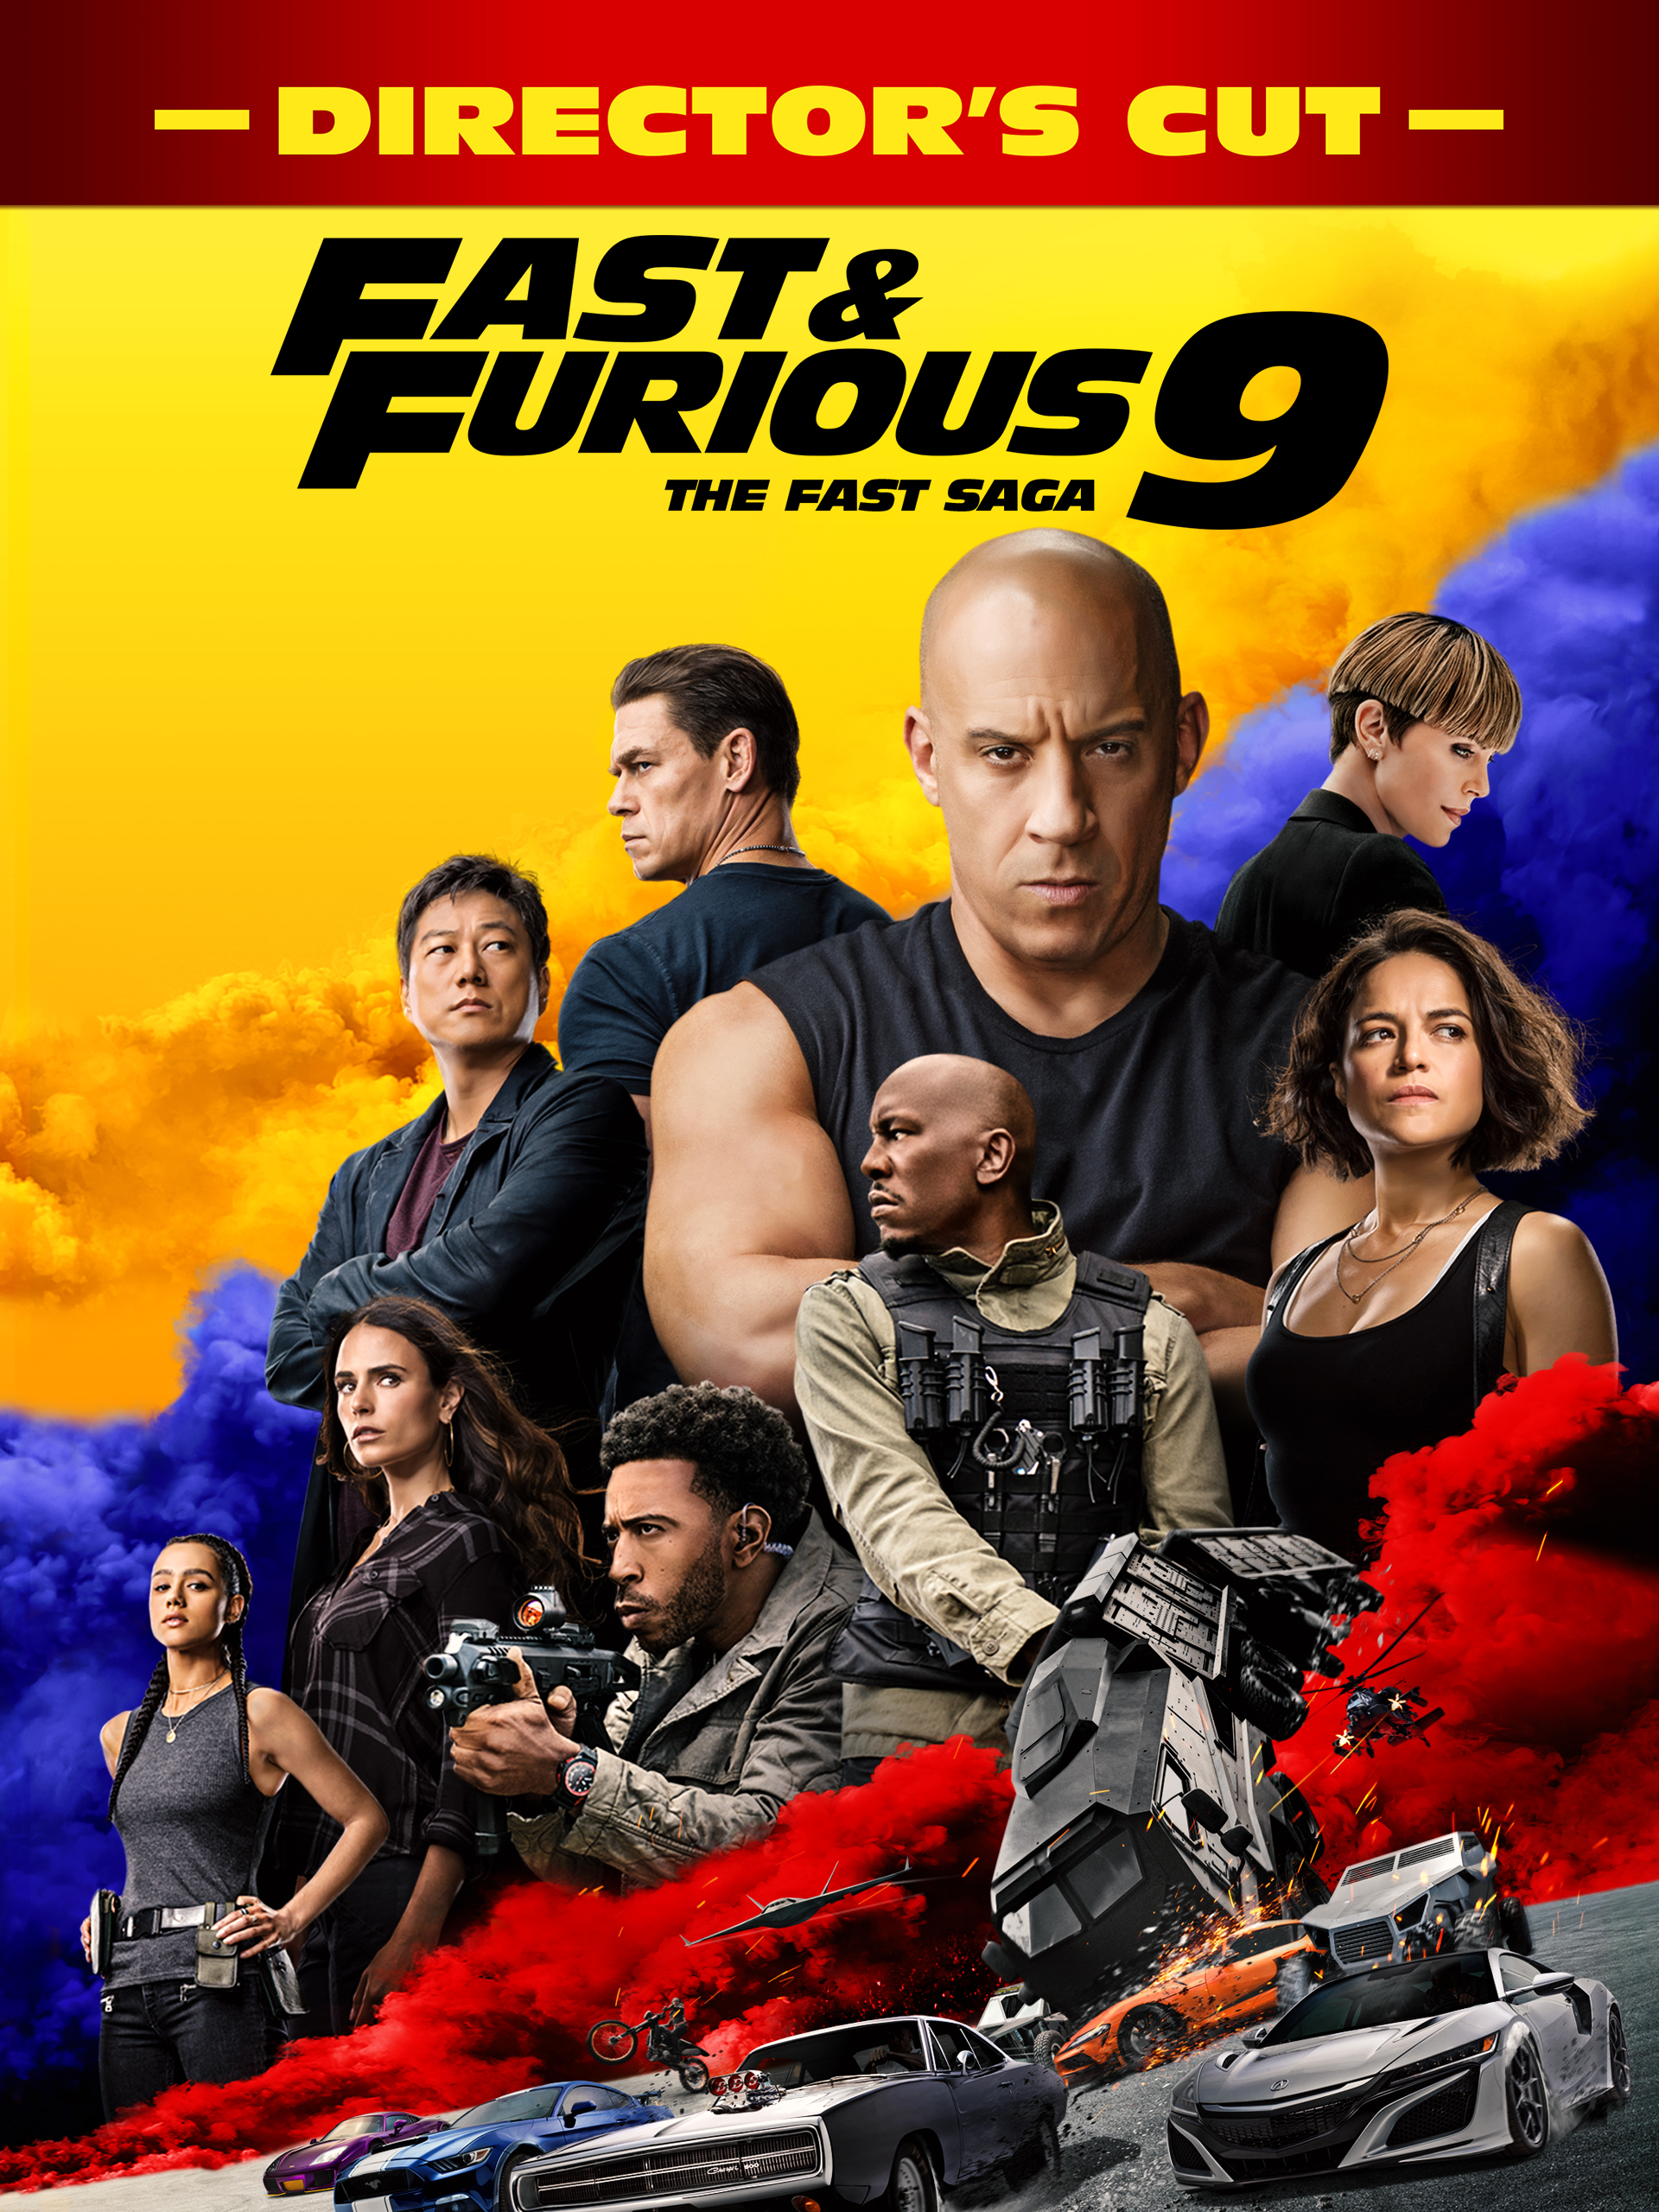 Prime Video: Fast & Furious 9 (Director's Cut)